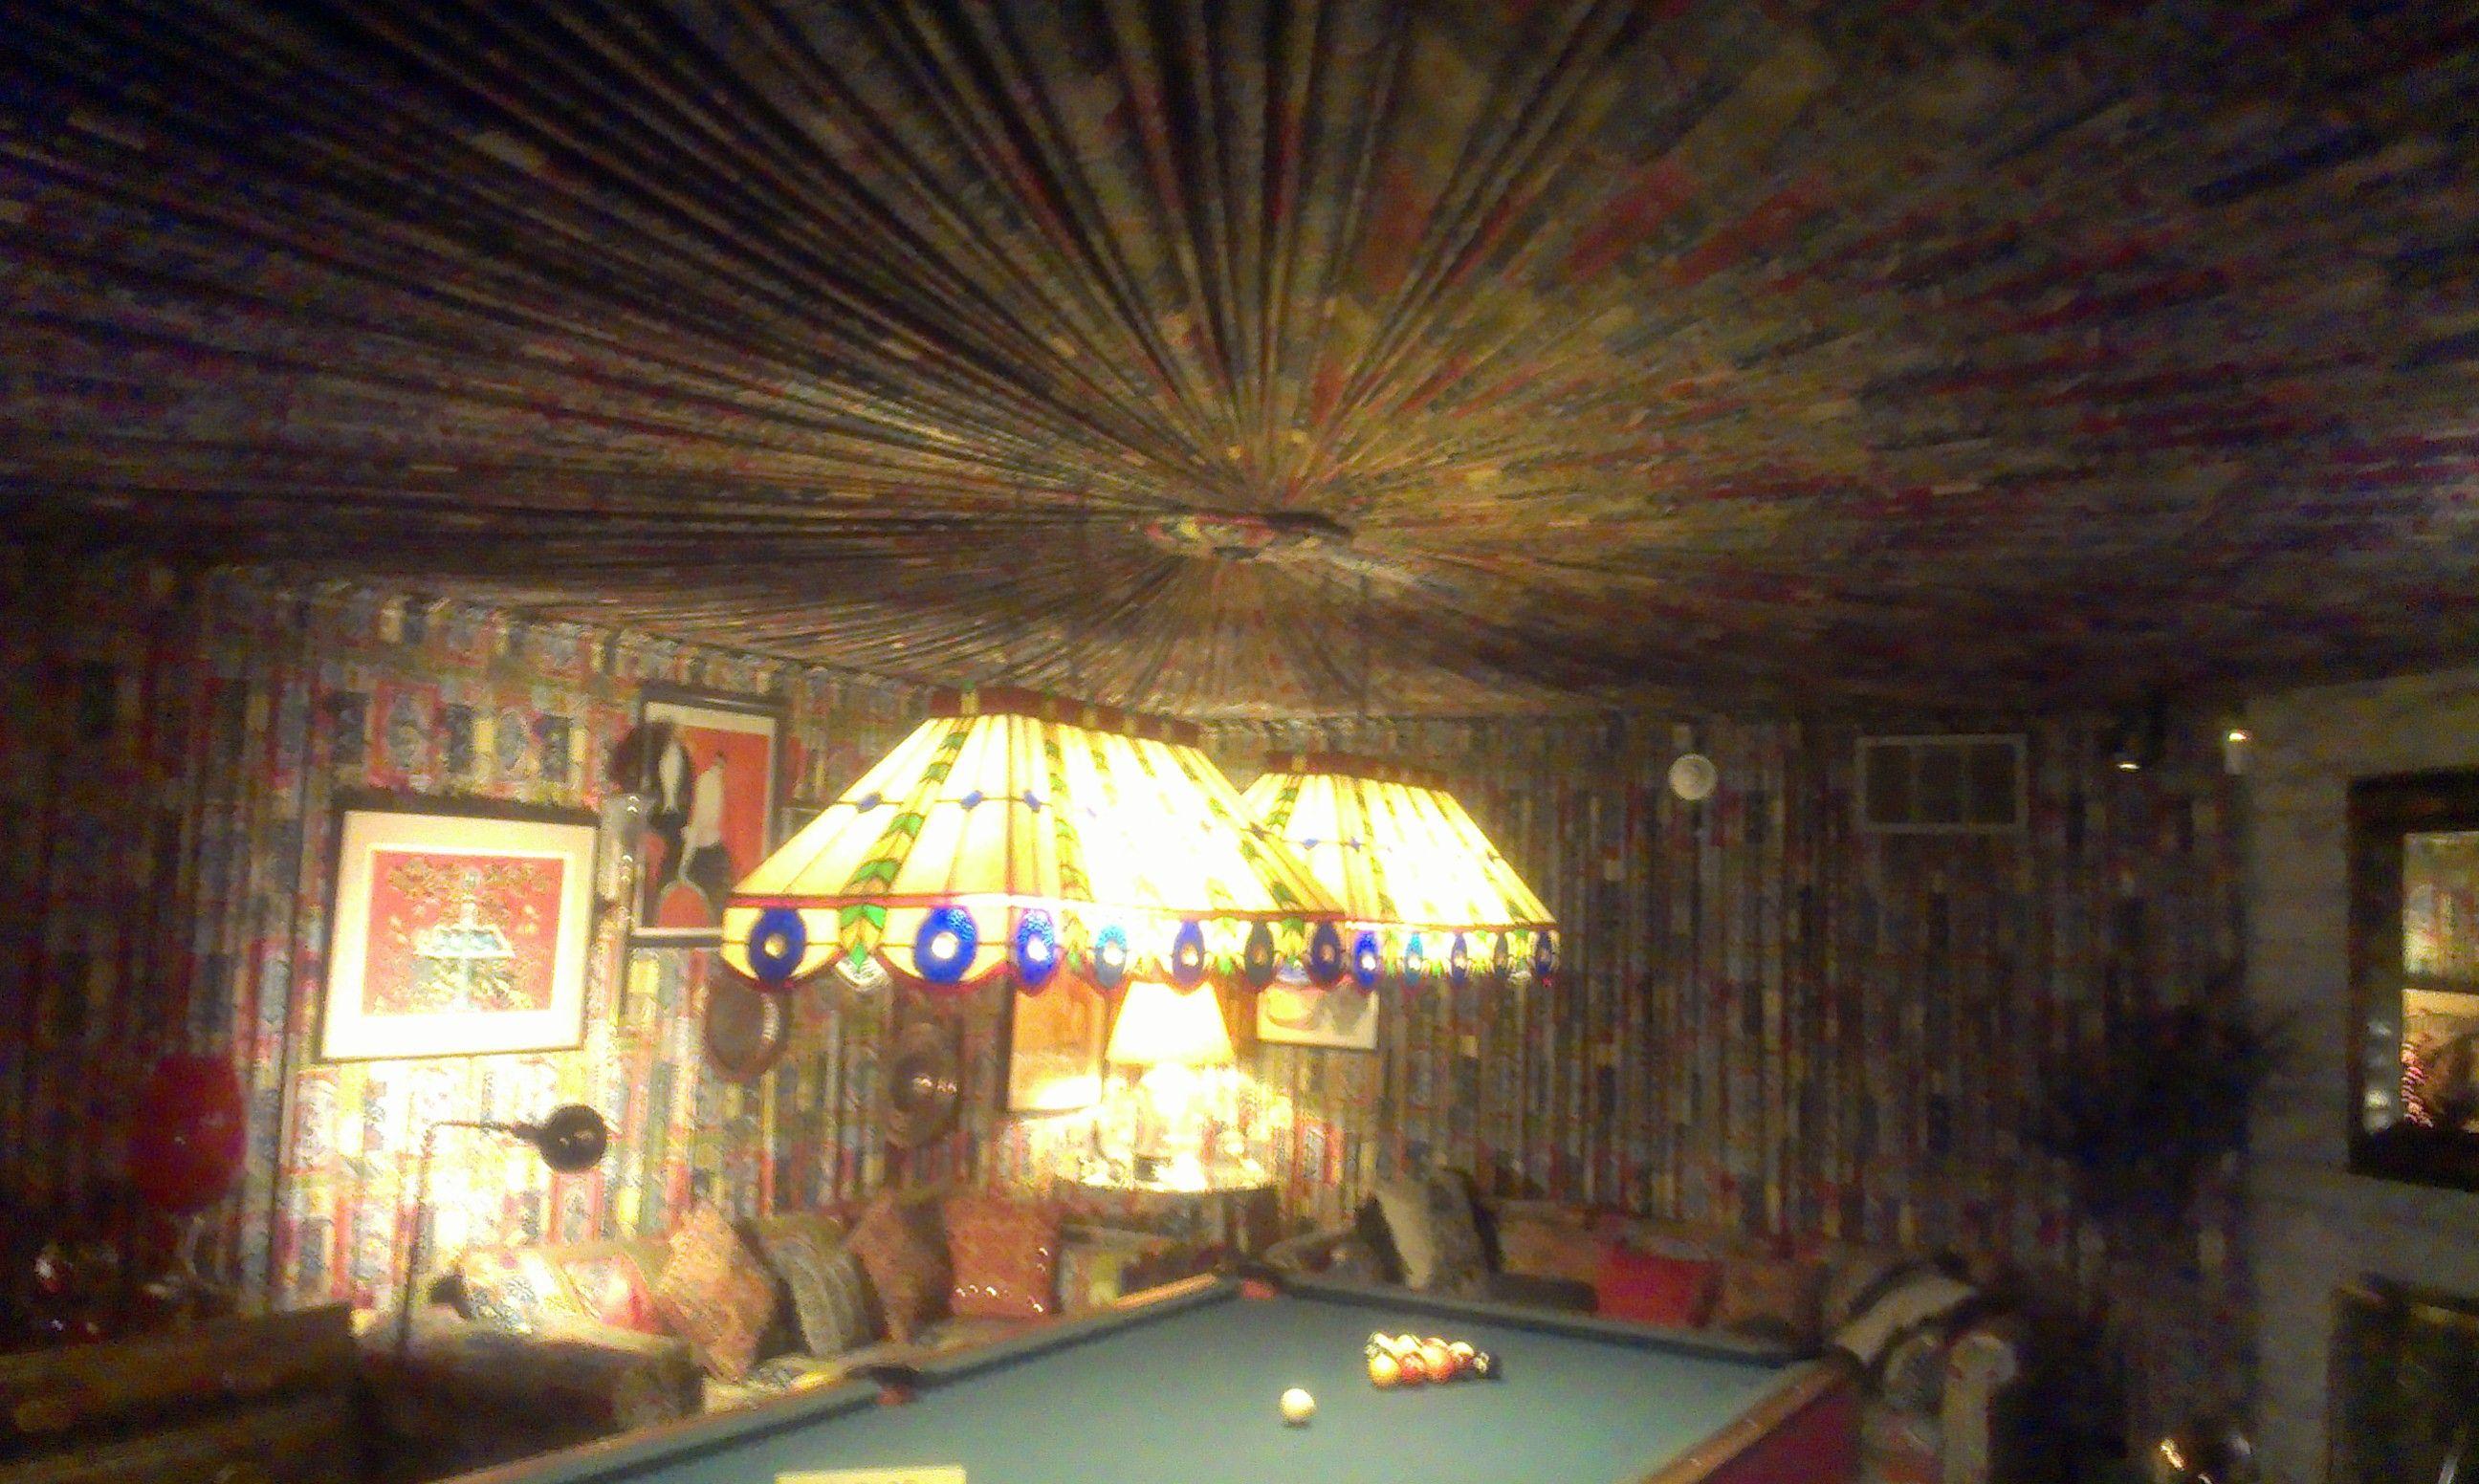 Memphis Tn Graceland Home Of Elvis Pool Table Room Pool Table Room Graceland Pool